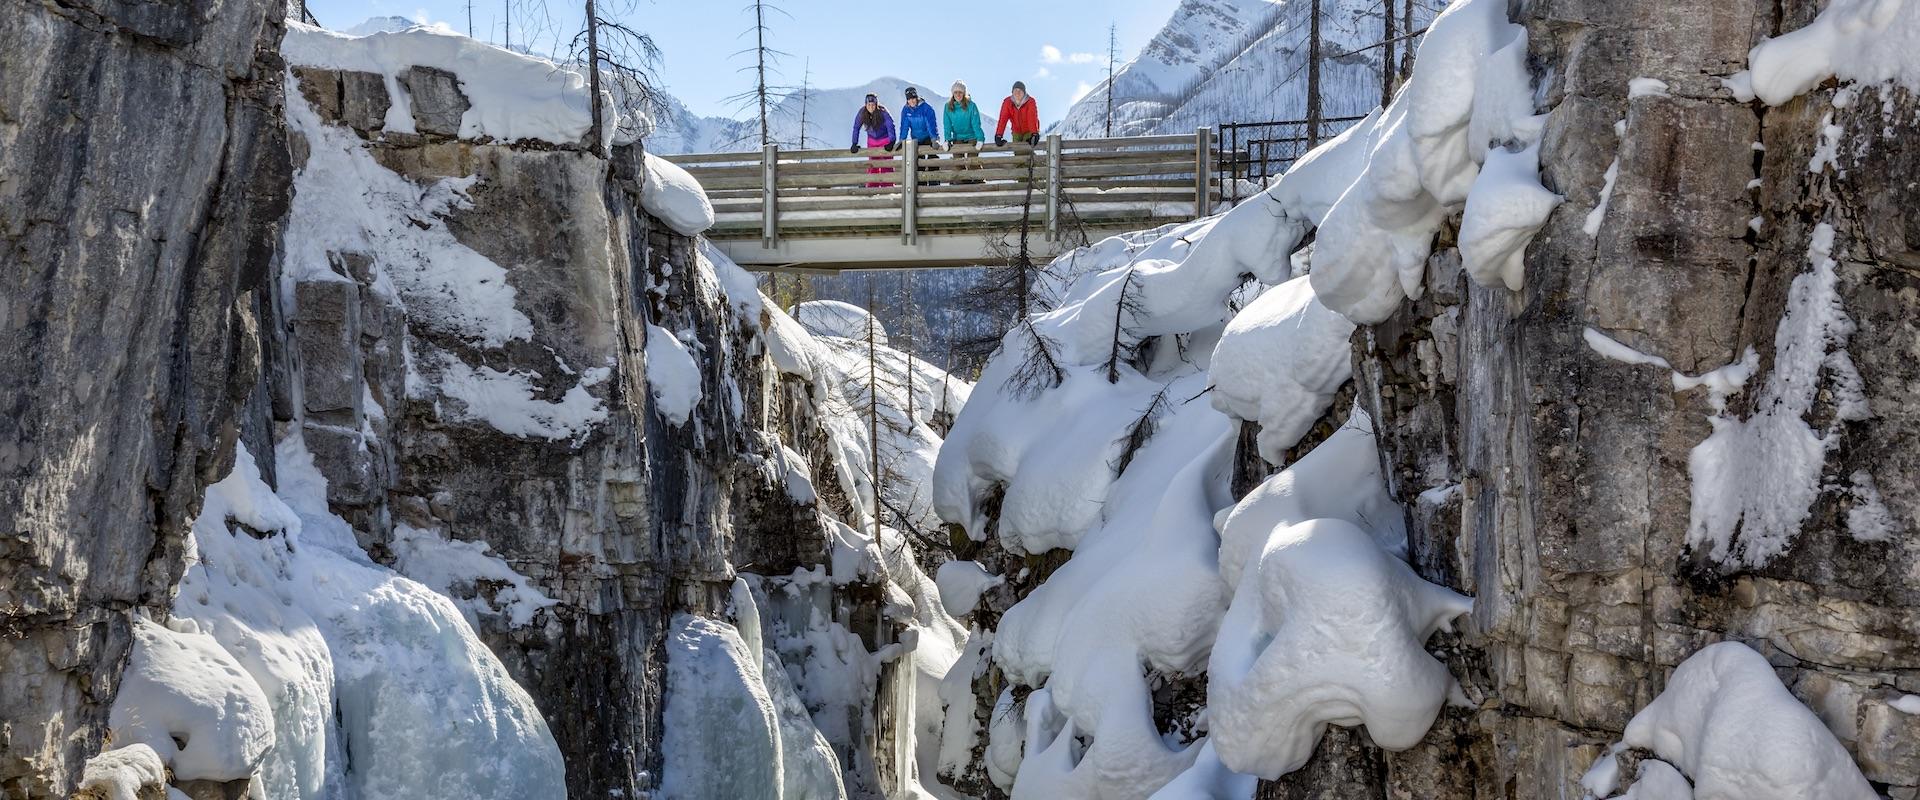 Snowshoeing Banff, Canadian Rockies